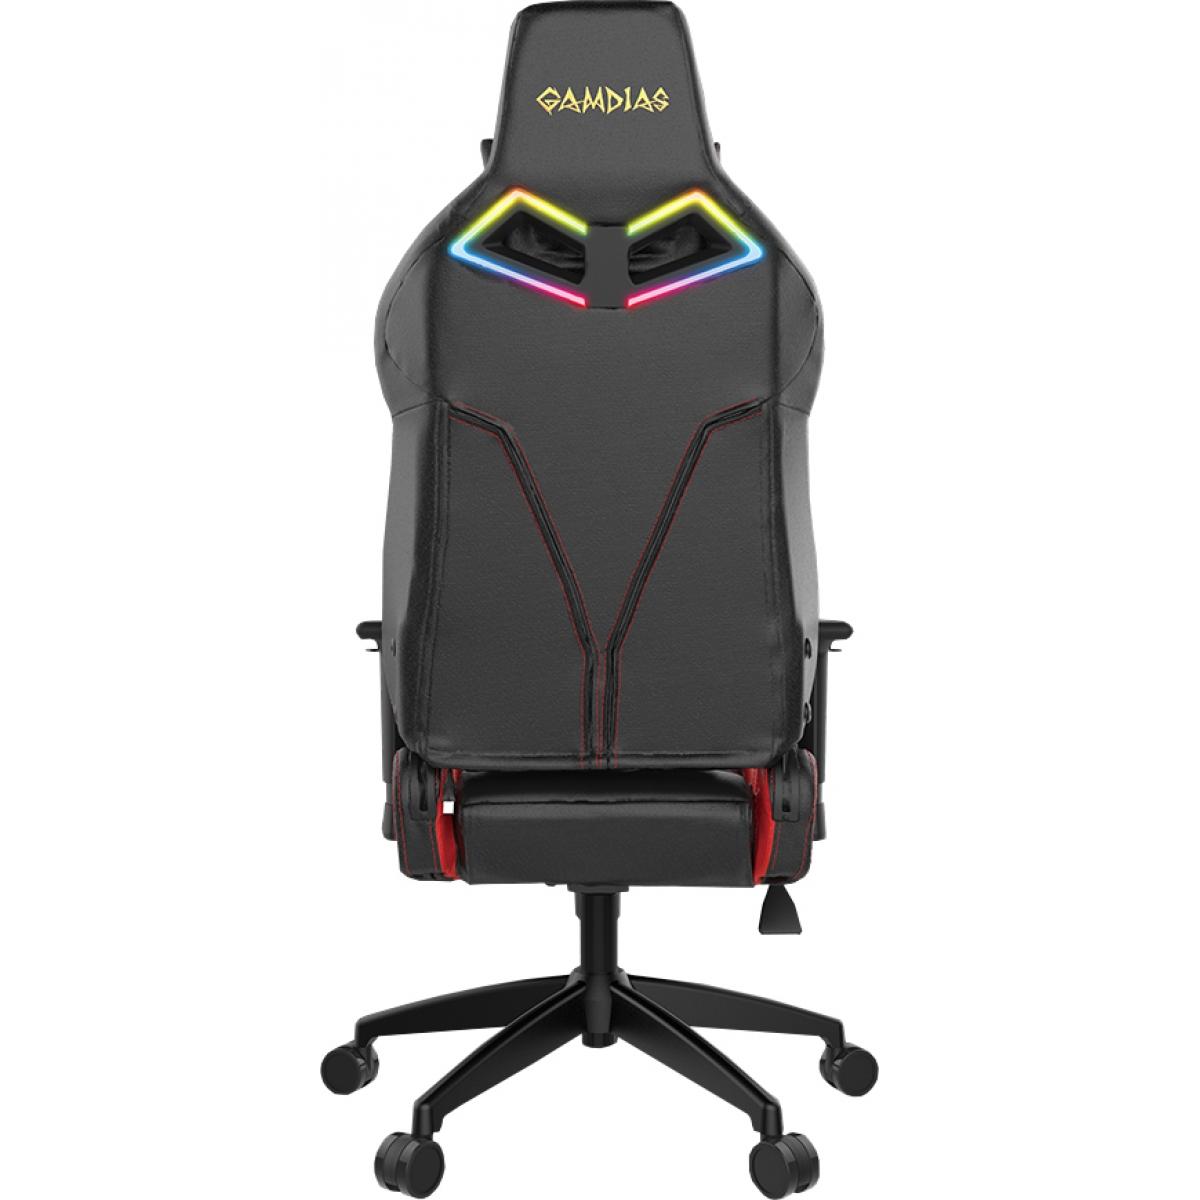 Cadeira Gamer Gamdias Achilles RGB E1 L, Black-Red, GD-ACHILLESE1LBR